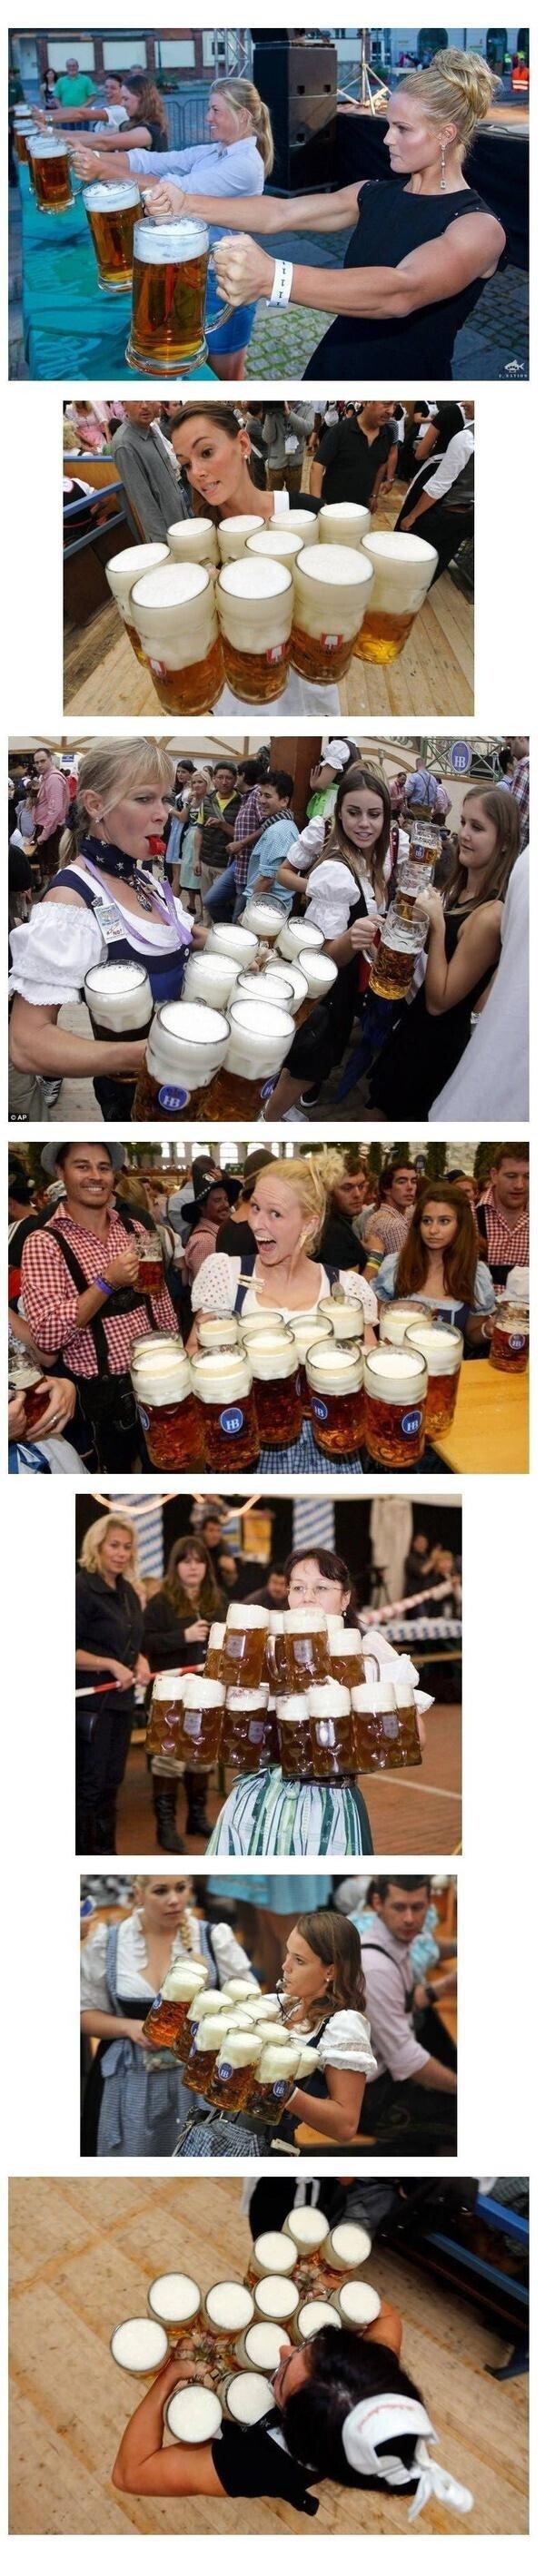 1508480314_b0306953_59e975c12b8dd.jpg 독일 맥주축제 알바면접